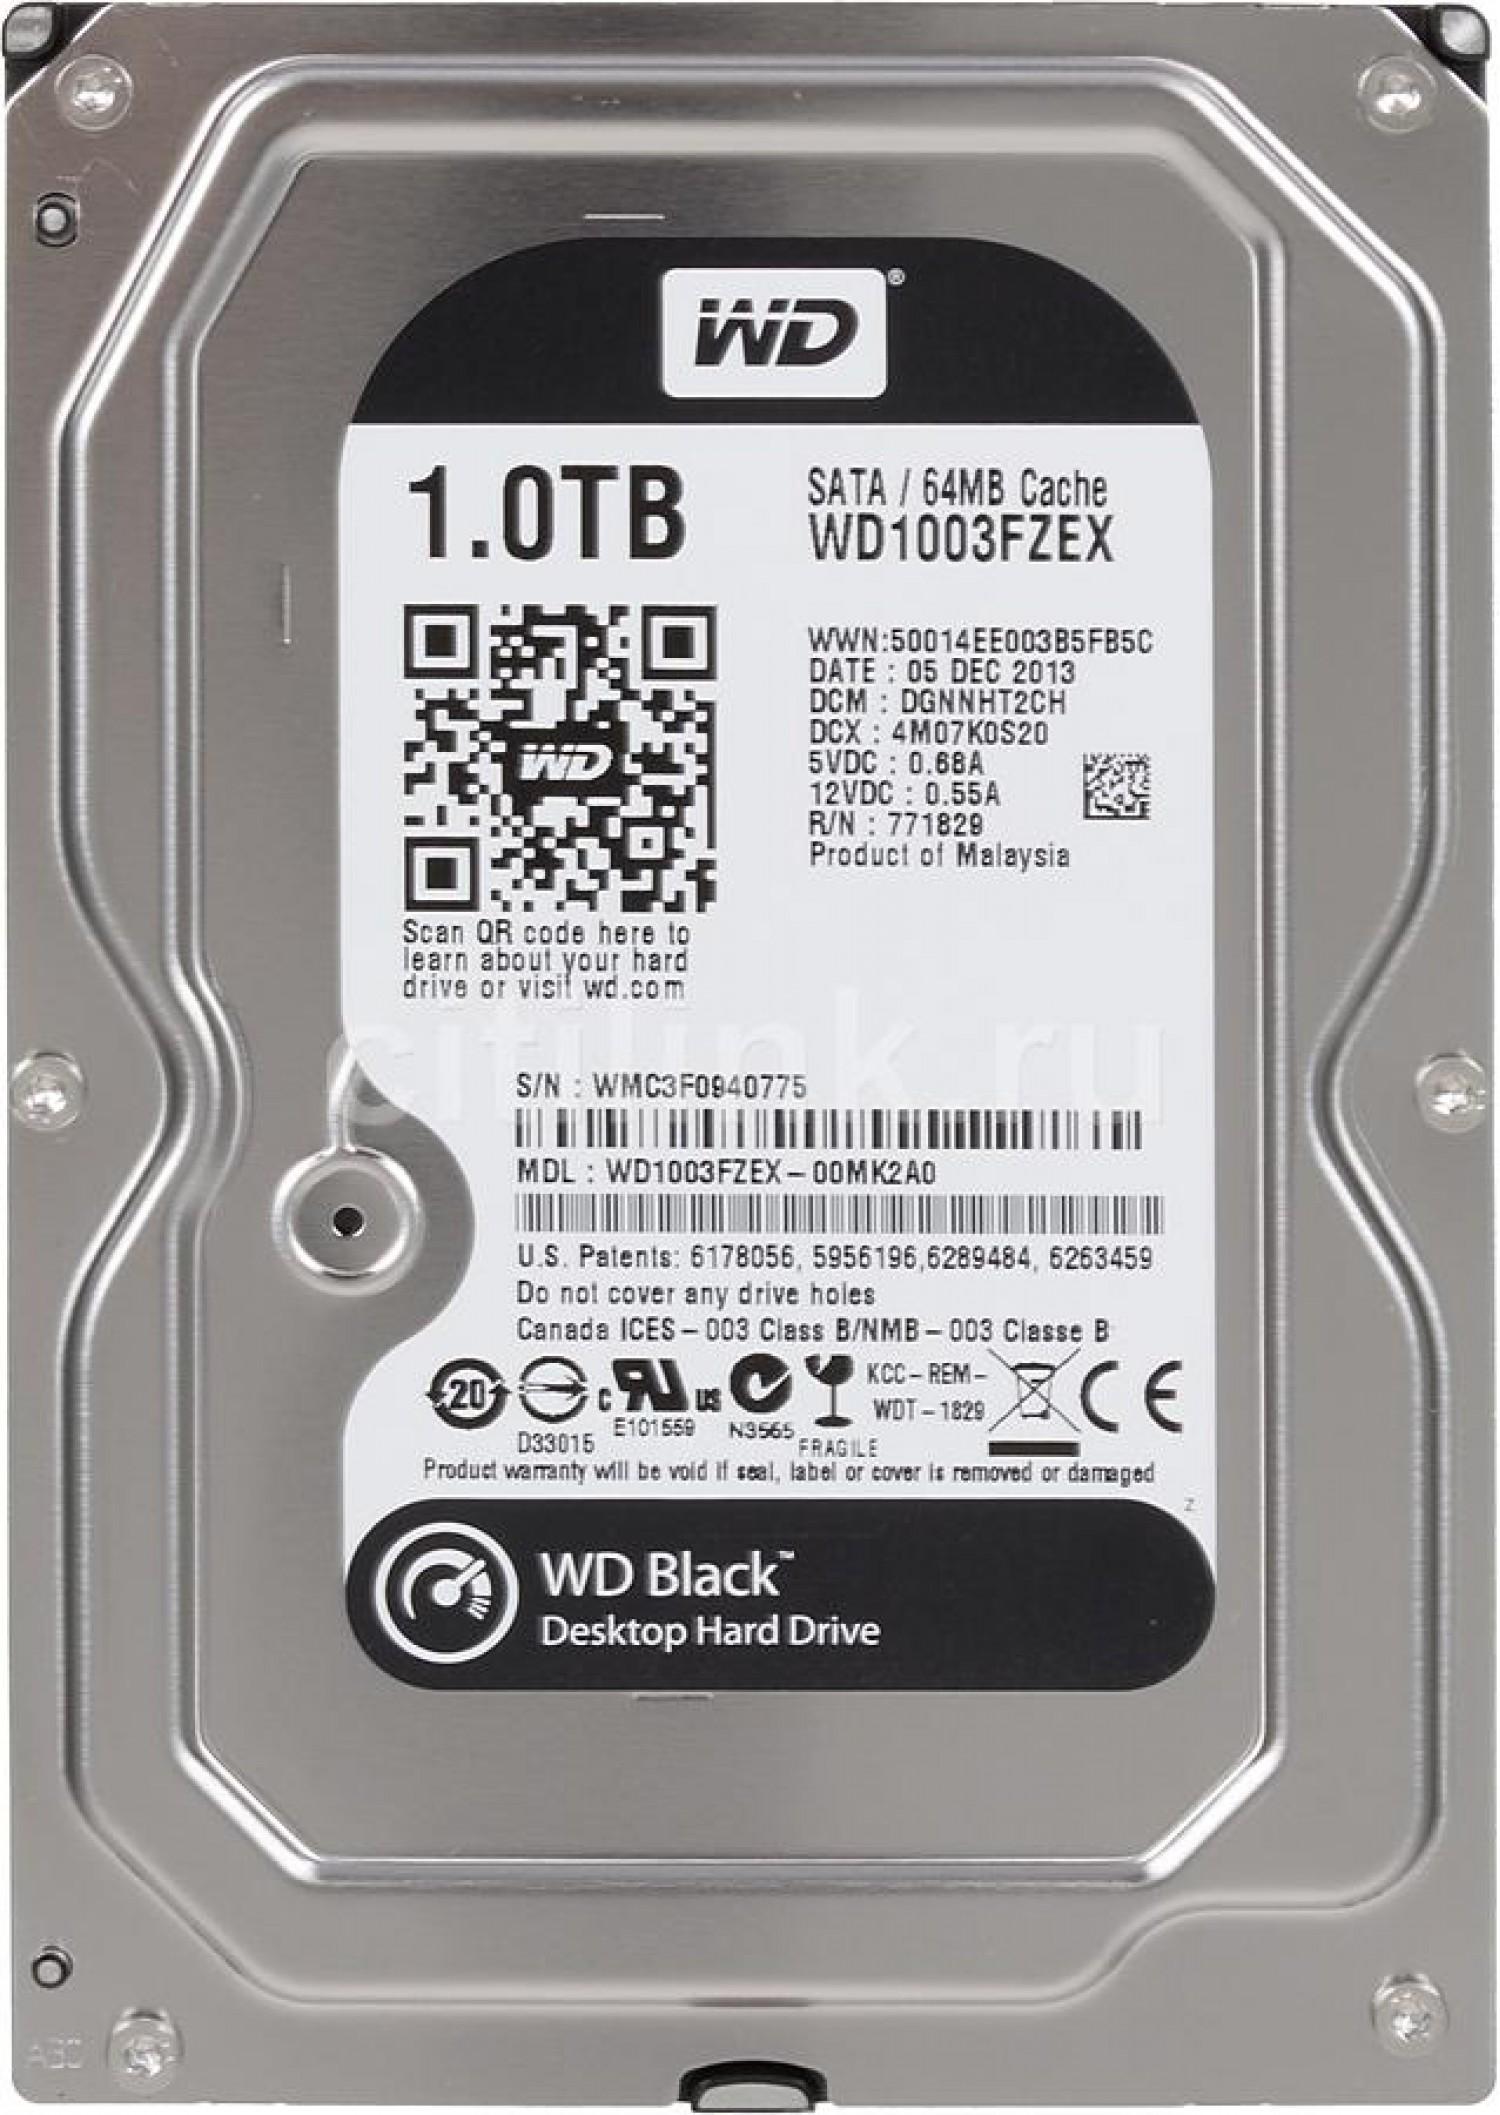 DISCO HDD WD S 1 TB 7200 S-ATA BLACK EDITION